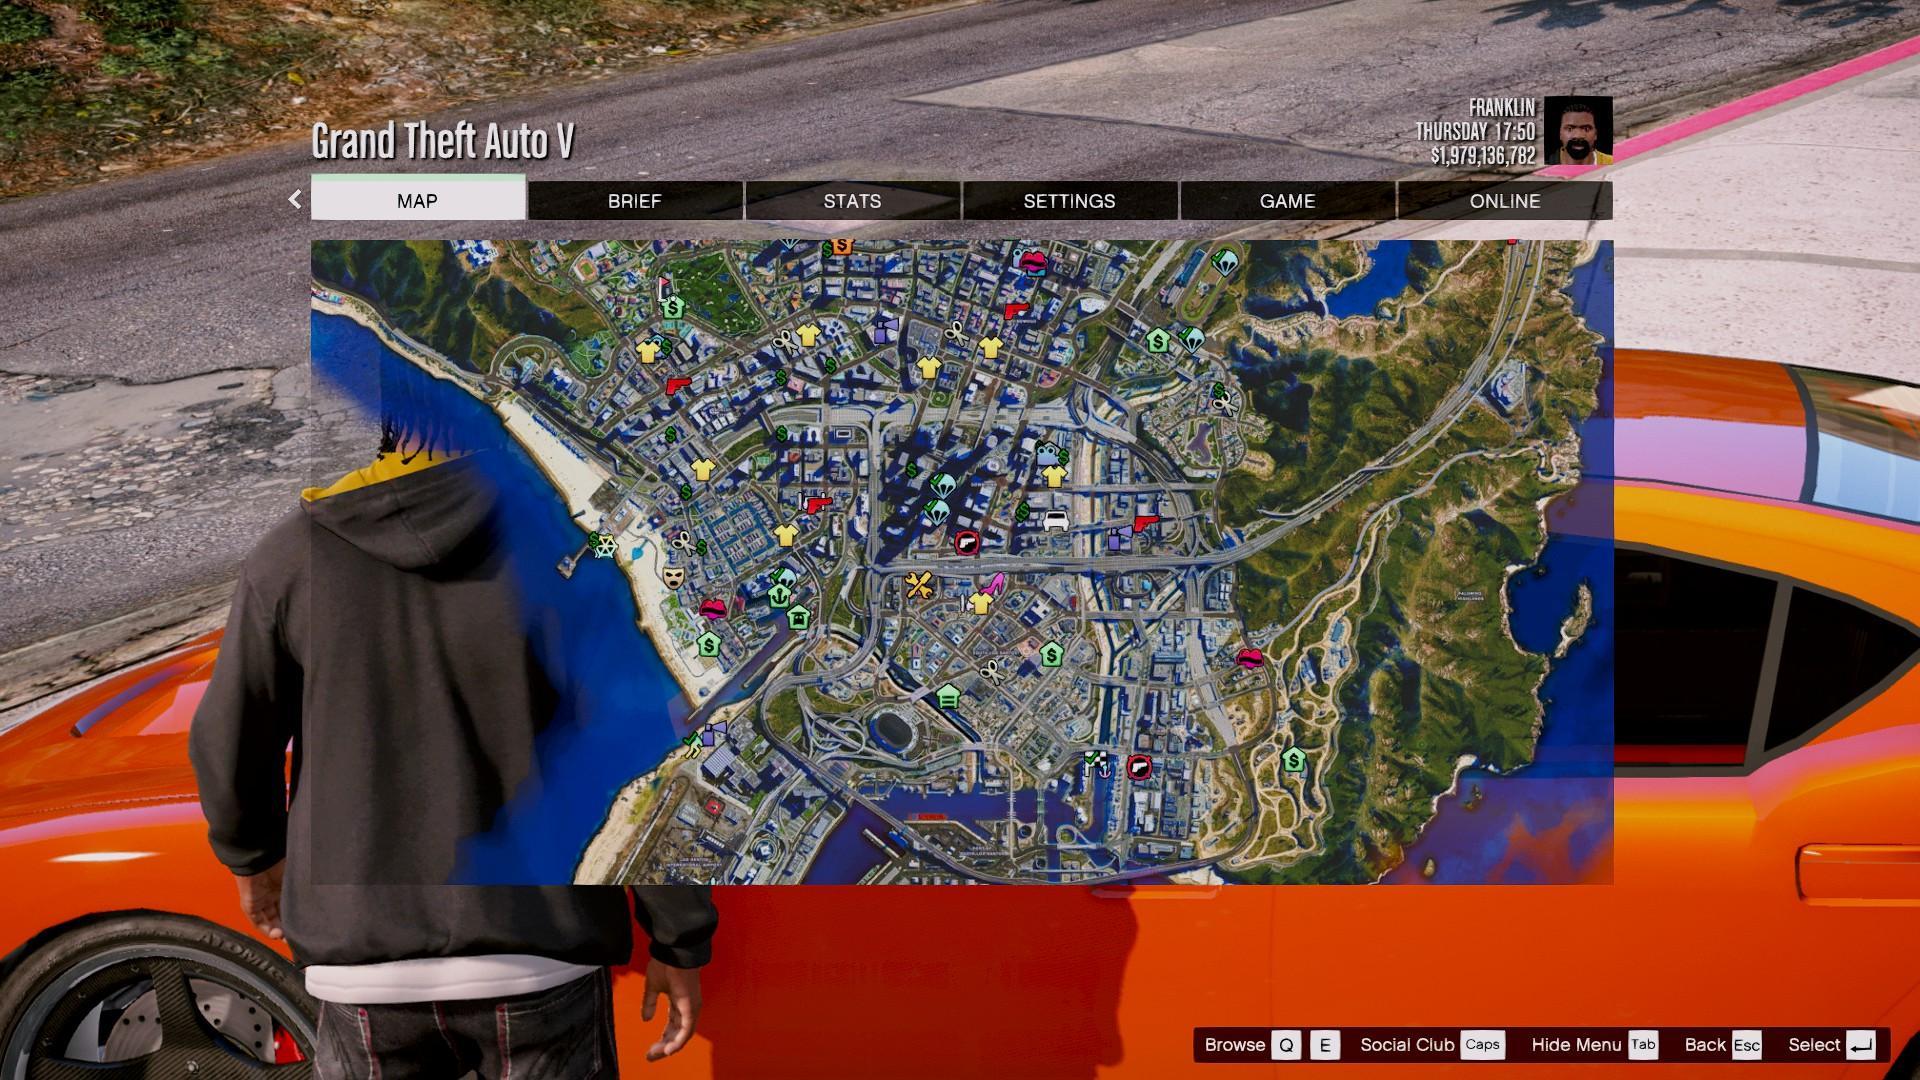 K Satellite View Map Bundled With Radar Mod Zoom Script GTA - World satellite map live online